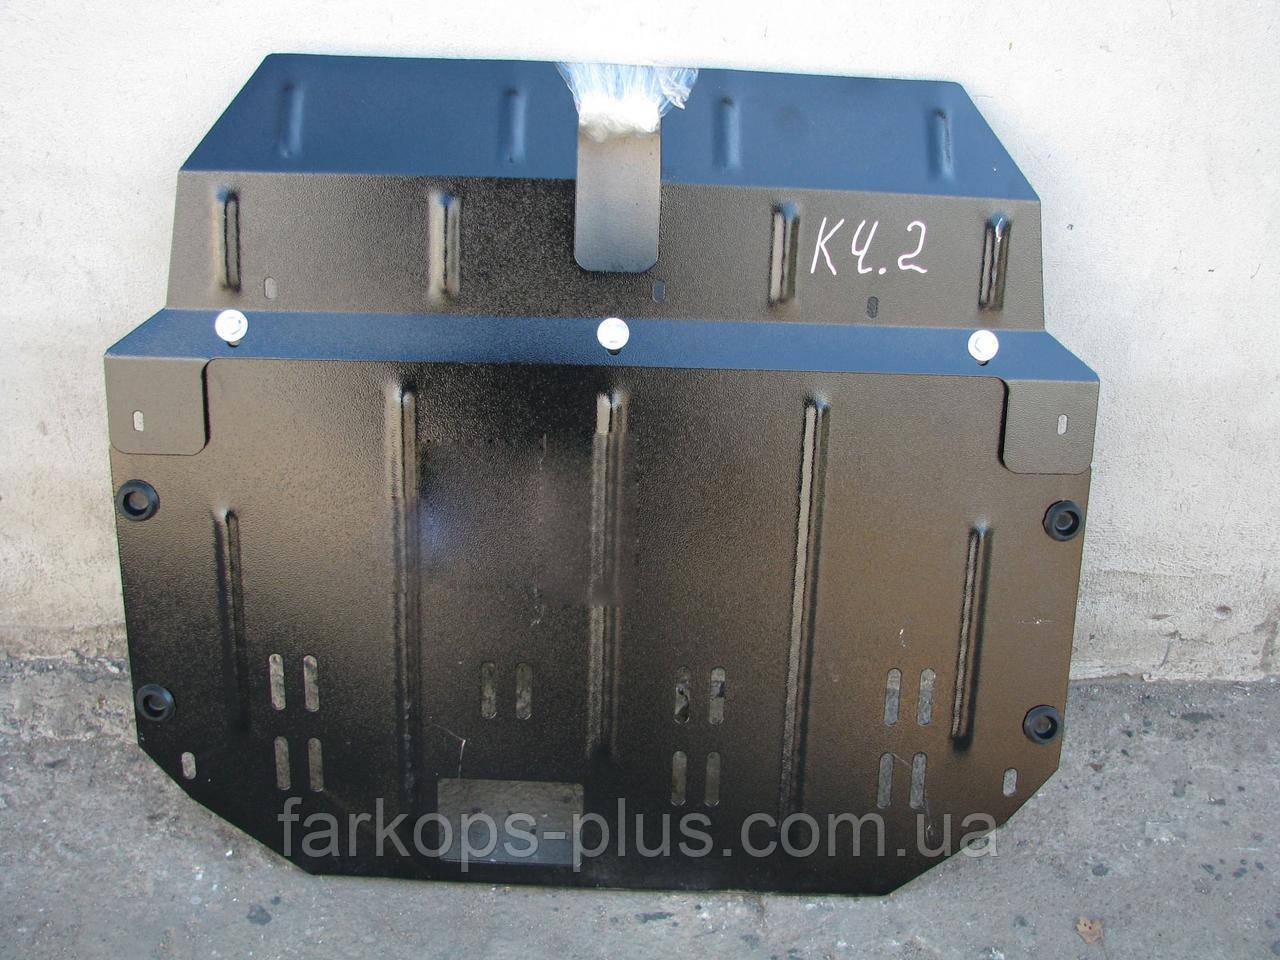 Захист двигуна і кпп - Hyundai i-30 (2007-2012) все